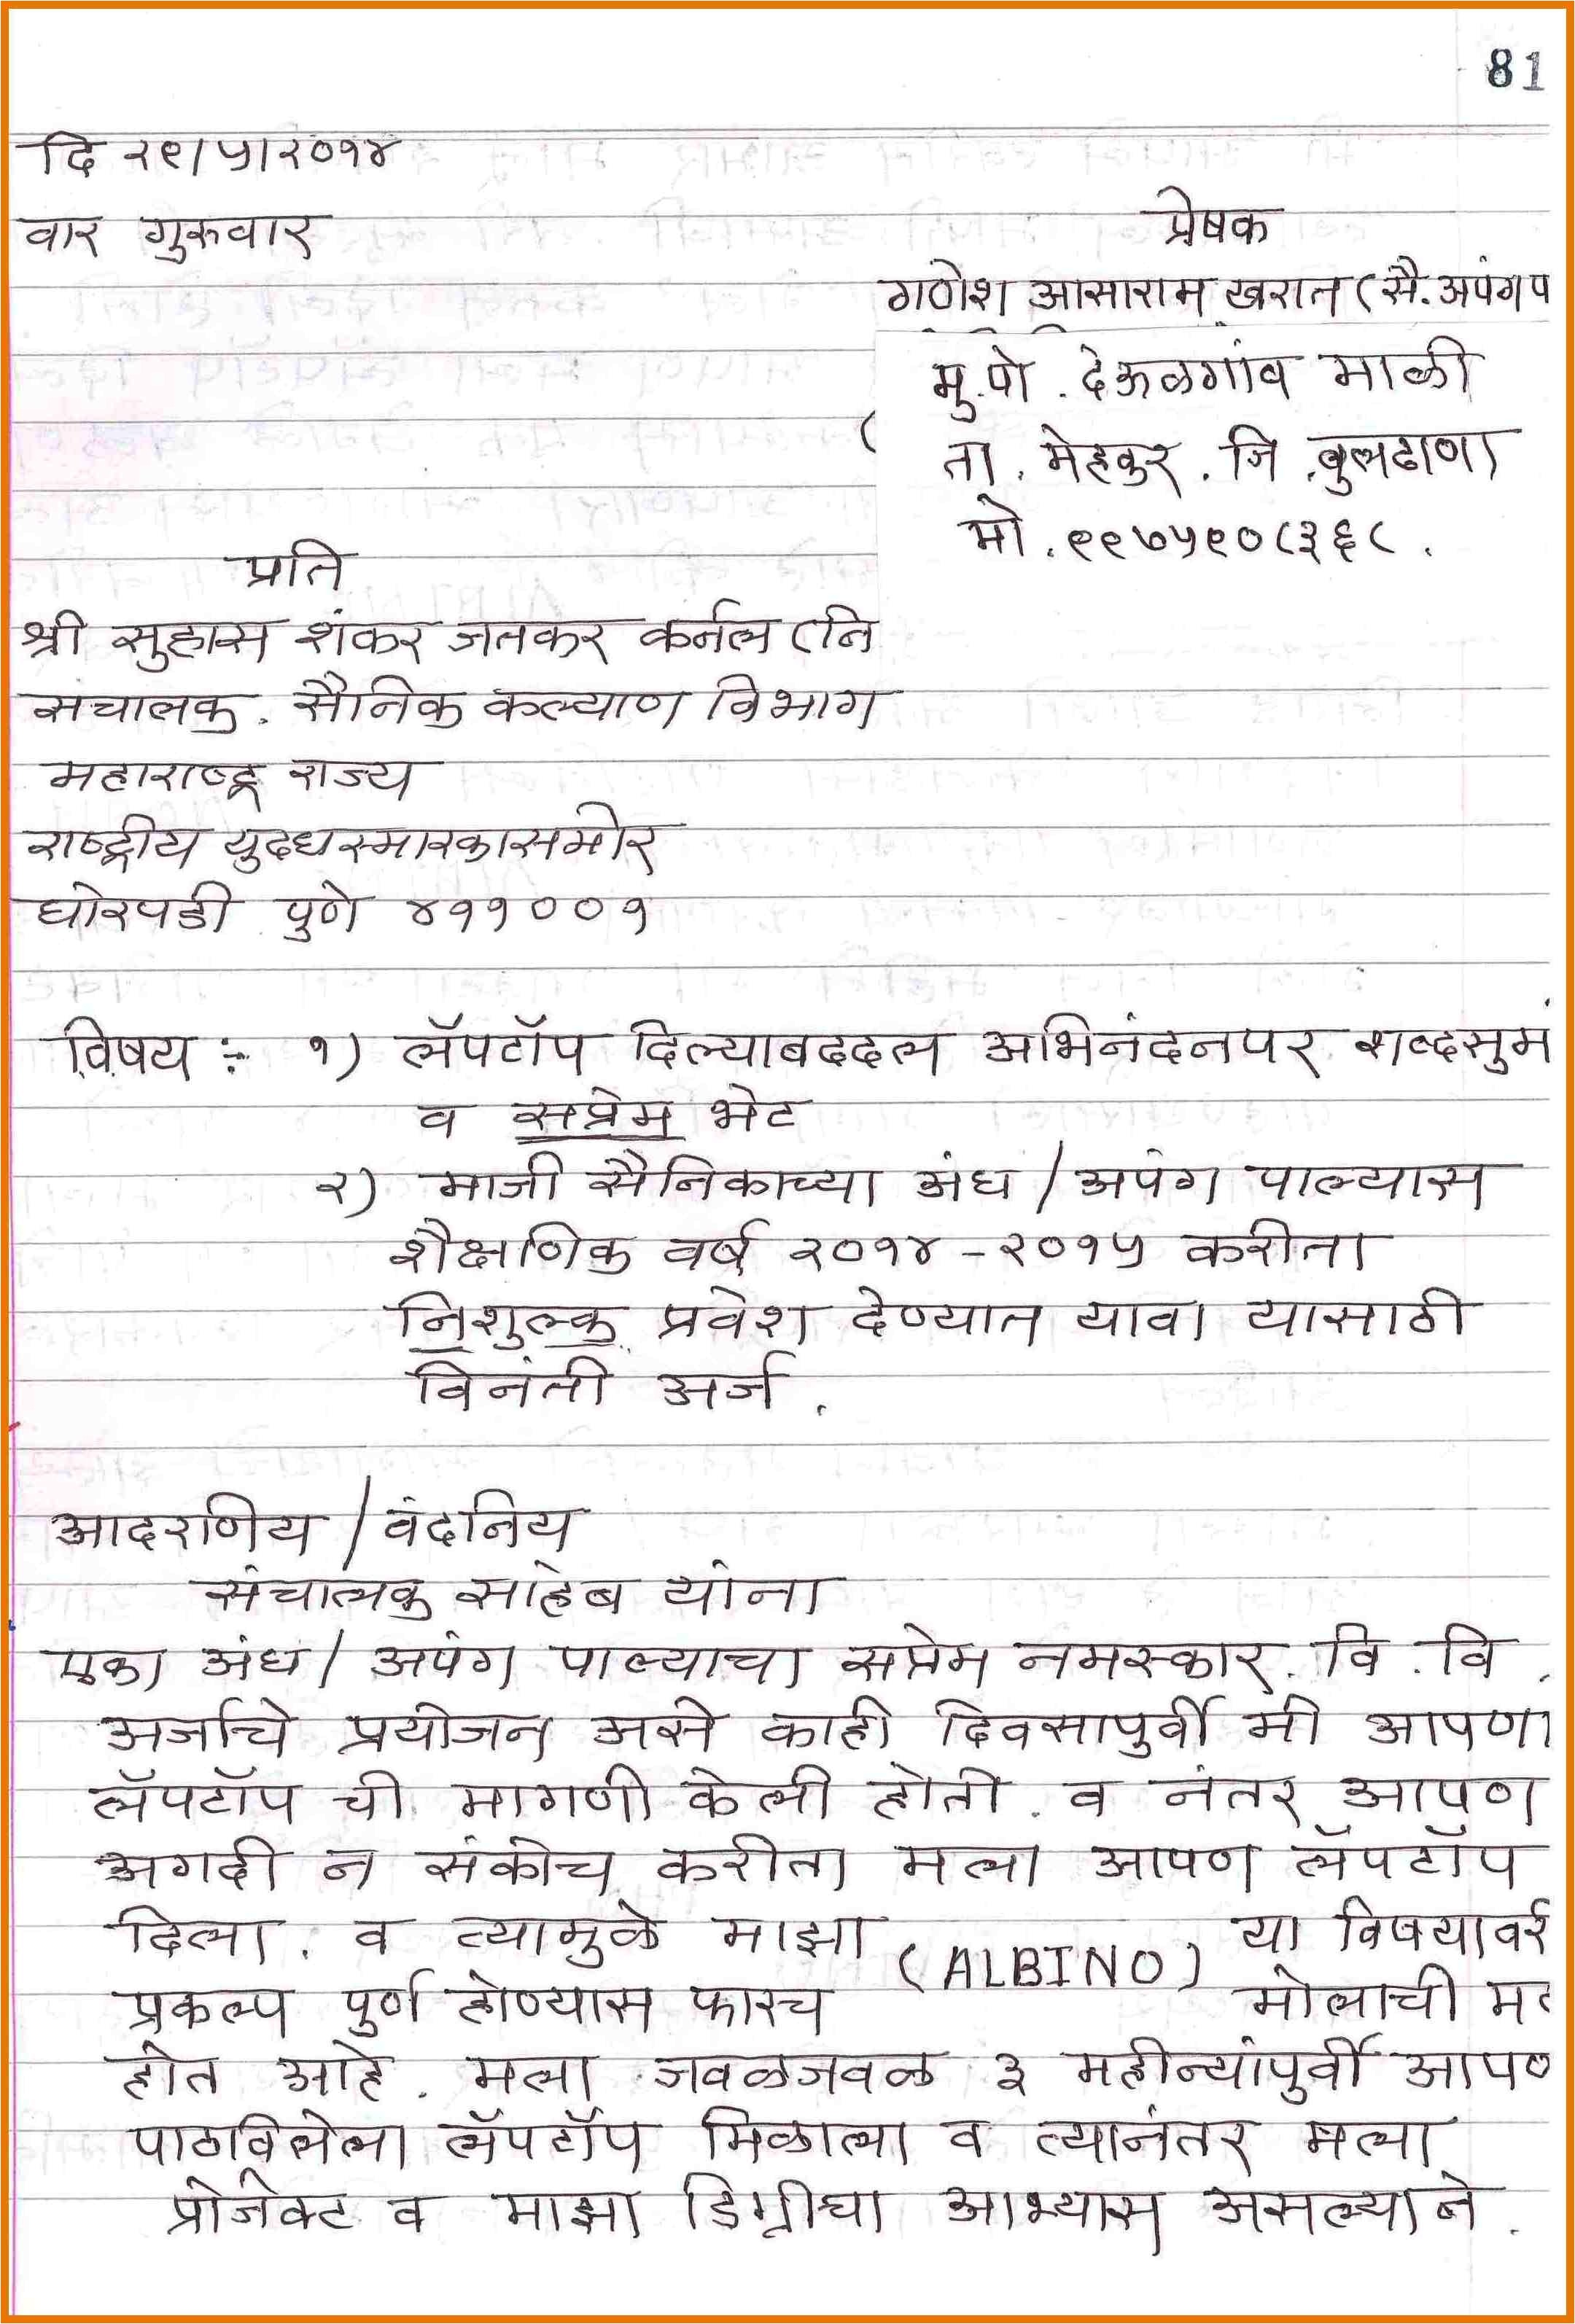 invitation letter in marathi